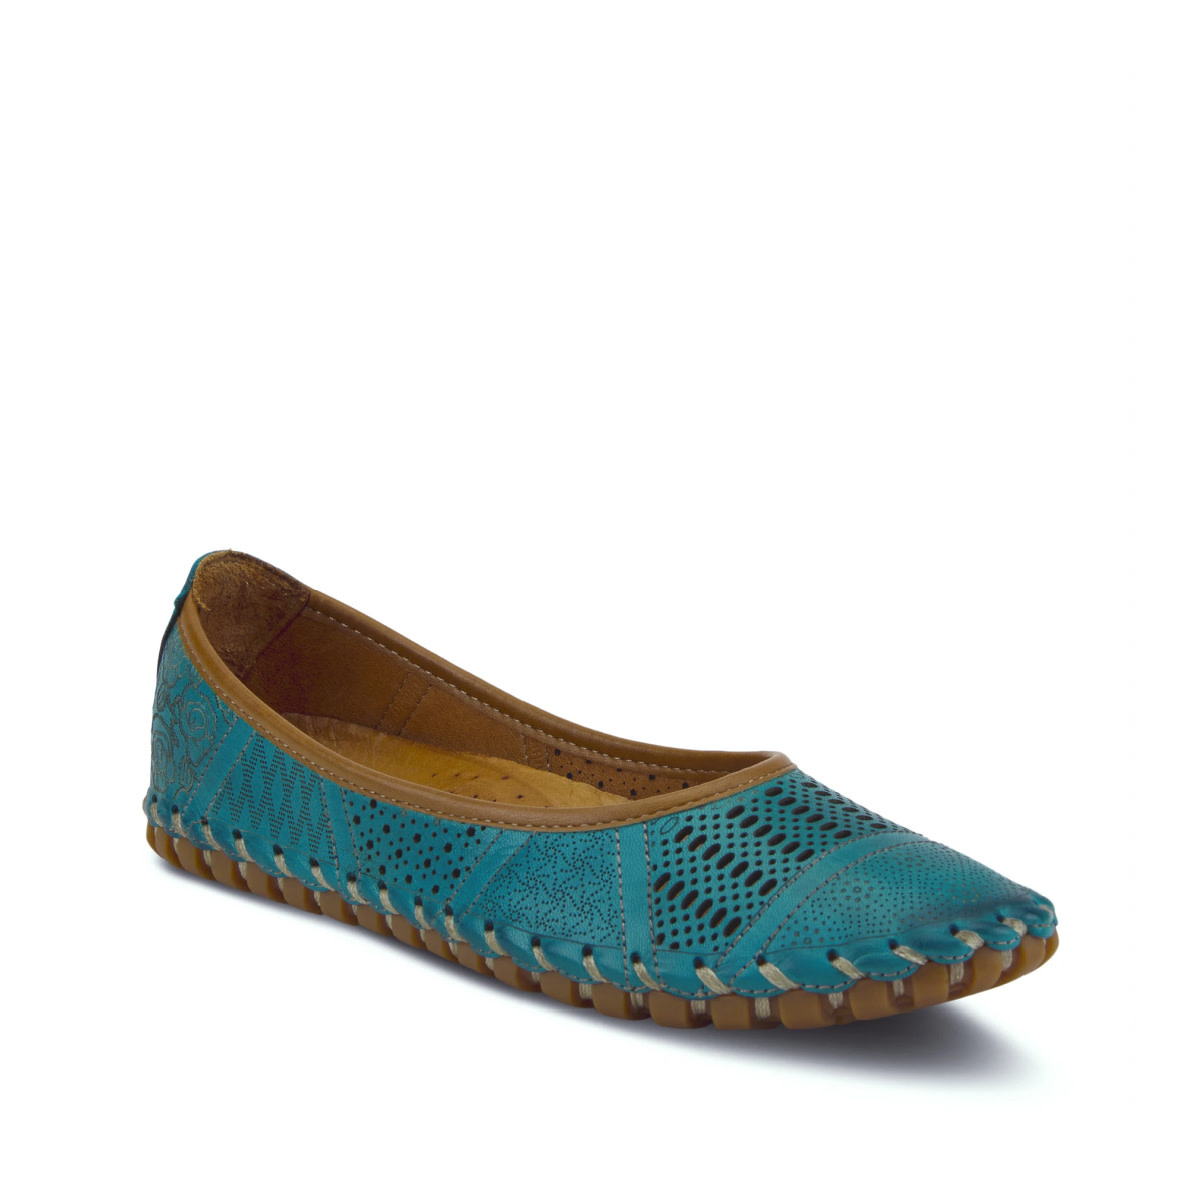 Spring Step Spring Step Kenyetta Shoe Turquoise